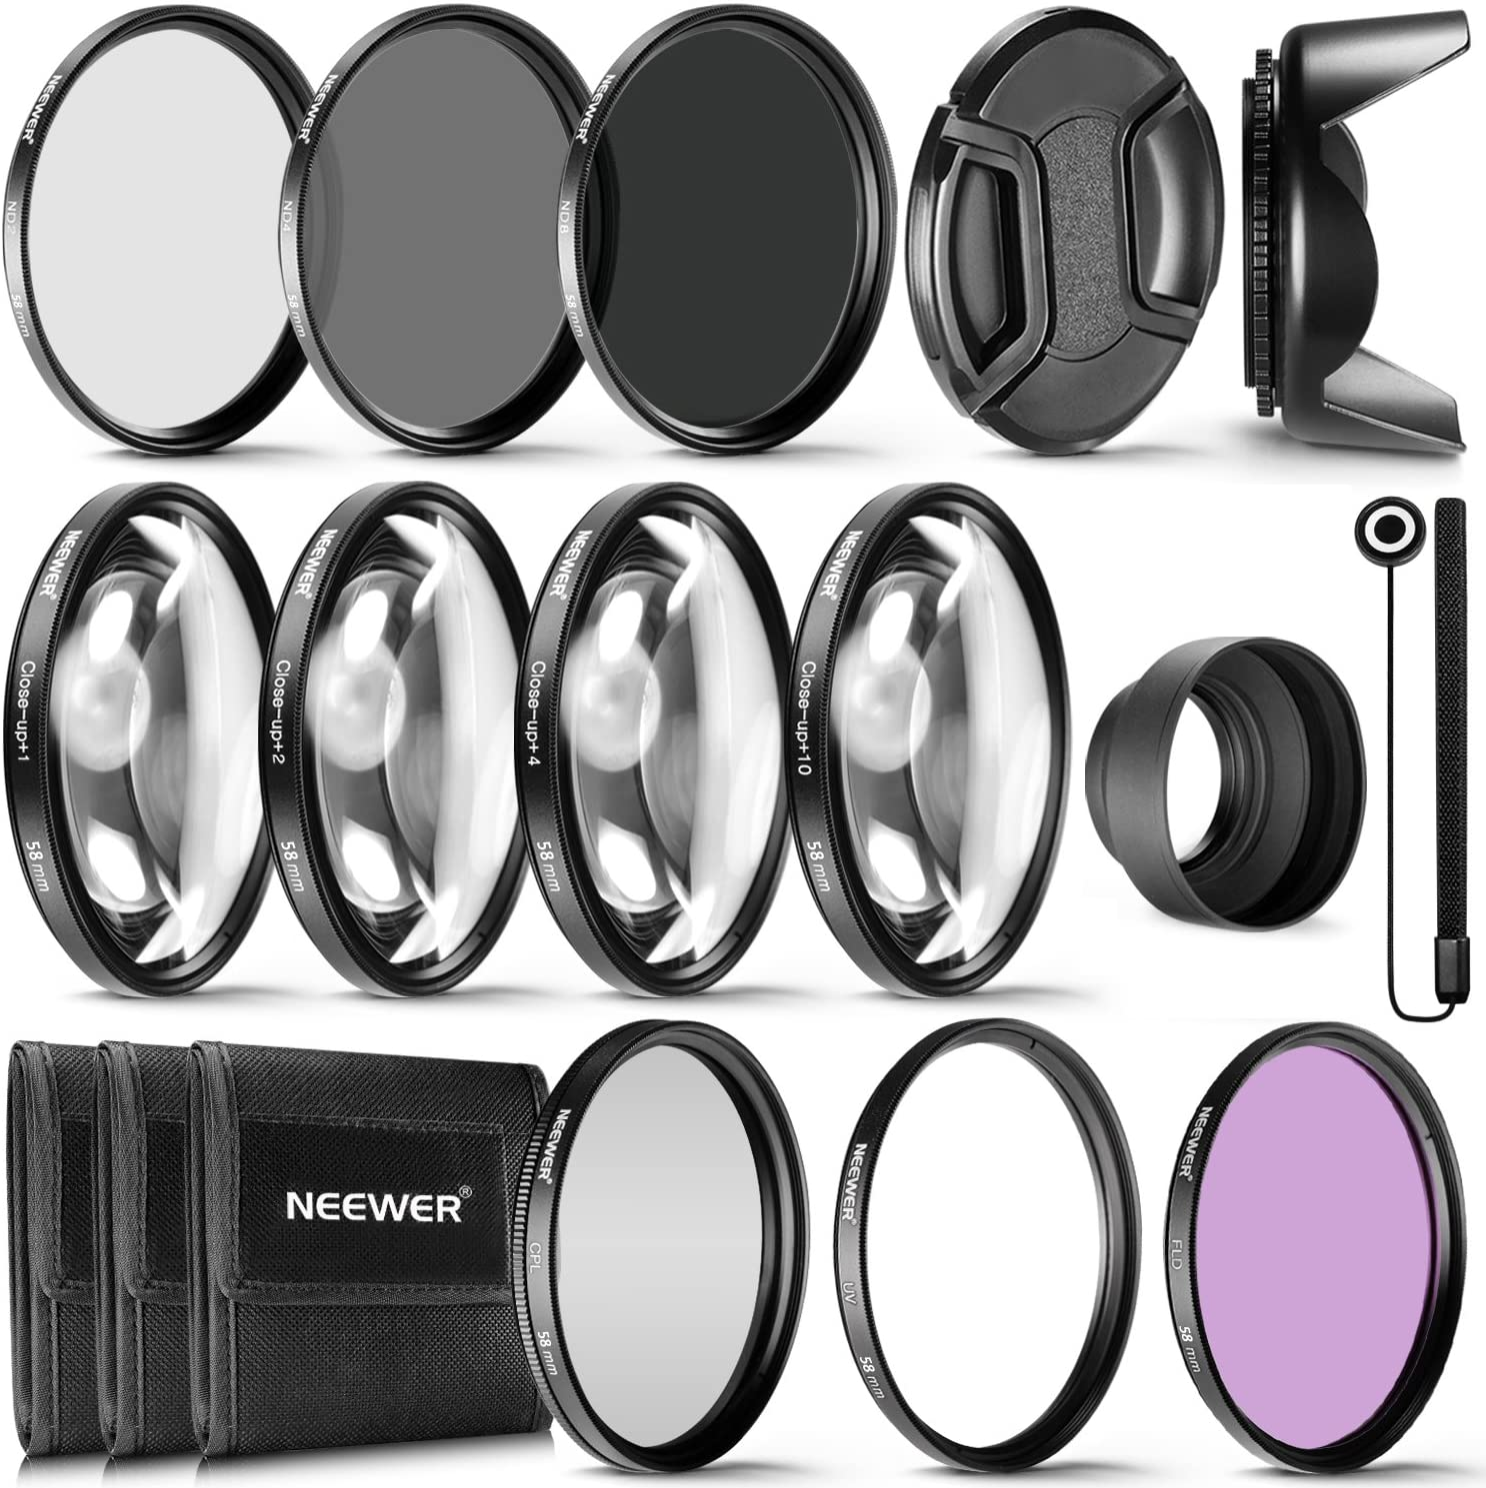 Kit Completo de filtros de Objetivos para Lentes de 58 mm de ...